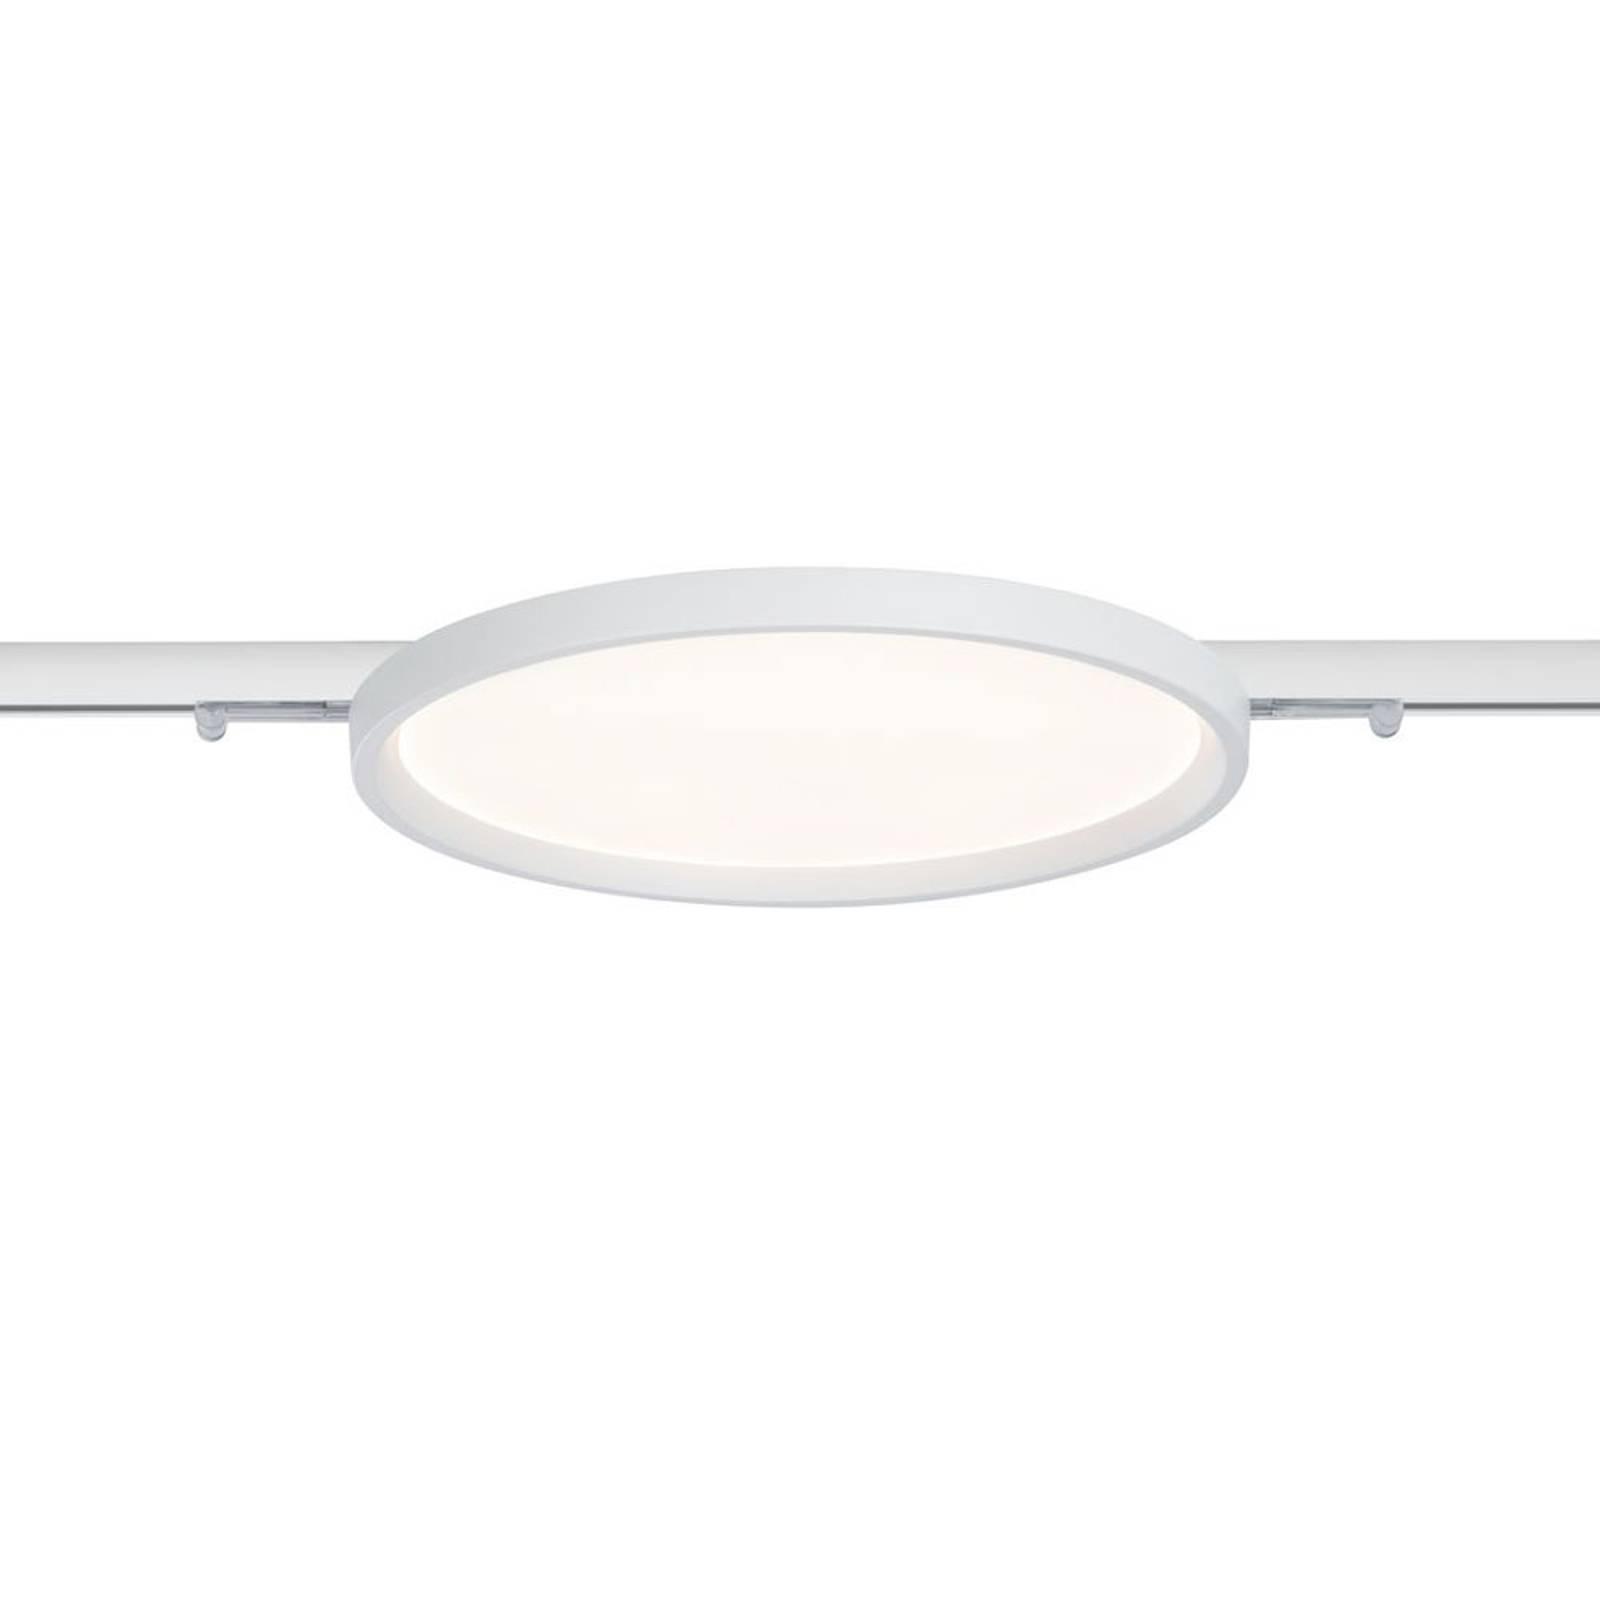 Paulmann NanoRail Plado -LED-paneeli valkoinen